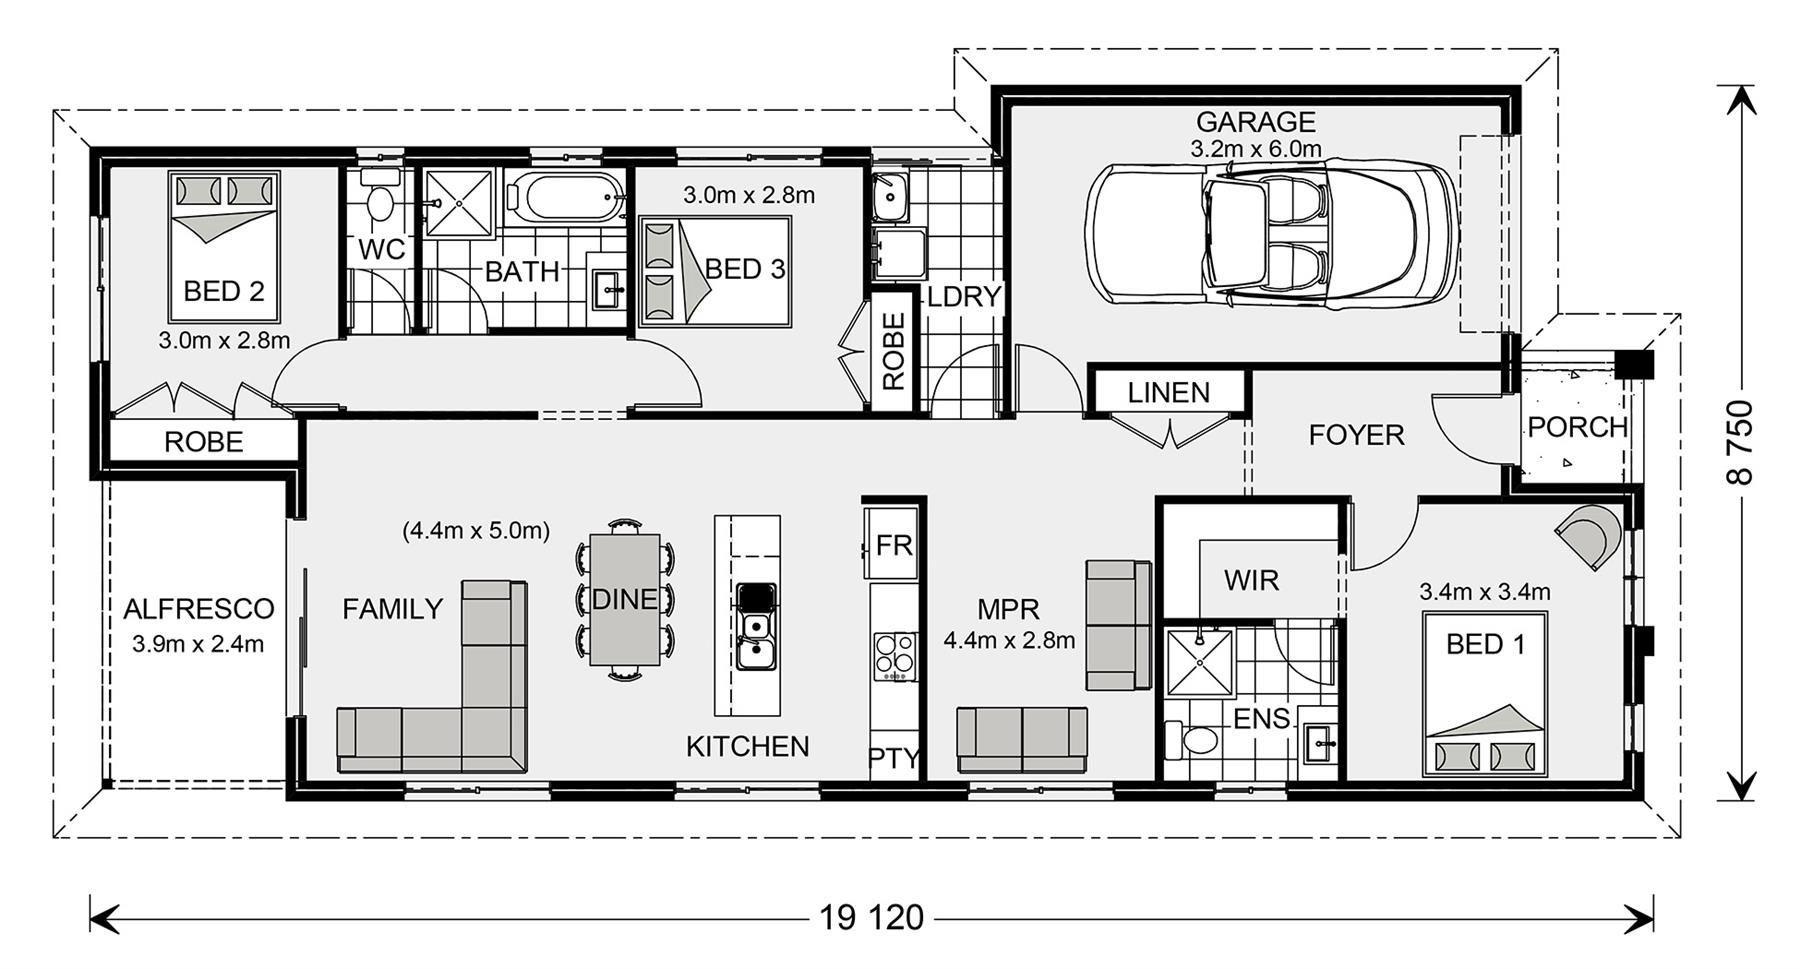 Lot 68 Bowline Court, Coronet Bay VIC 3984, Image 1